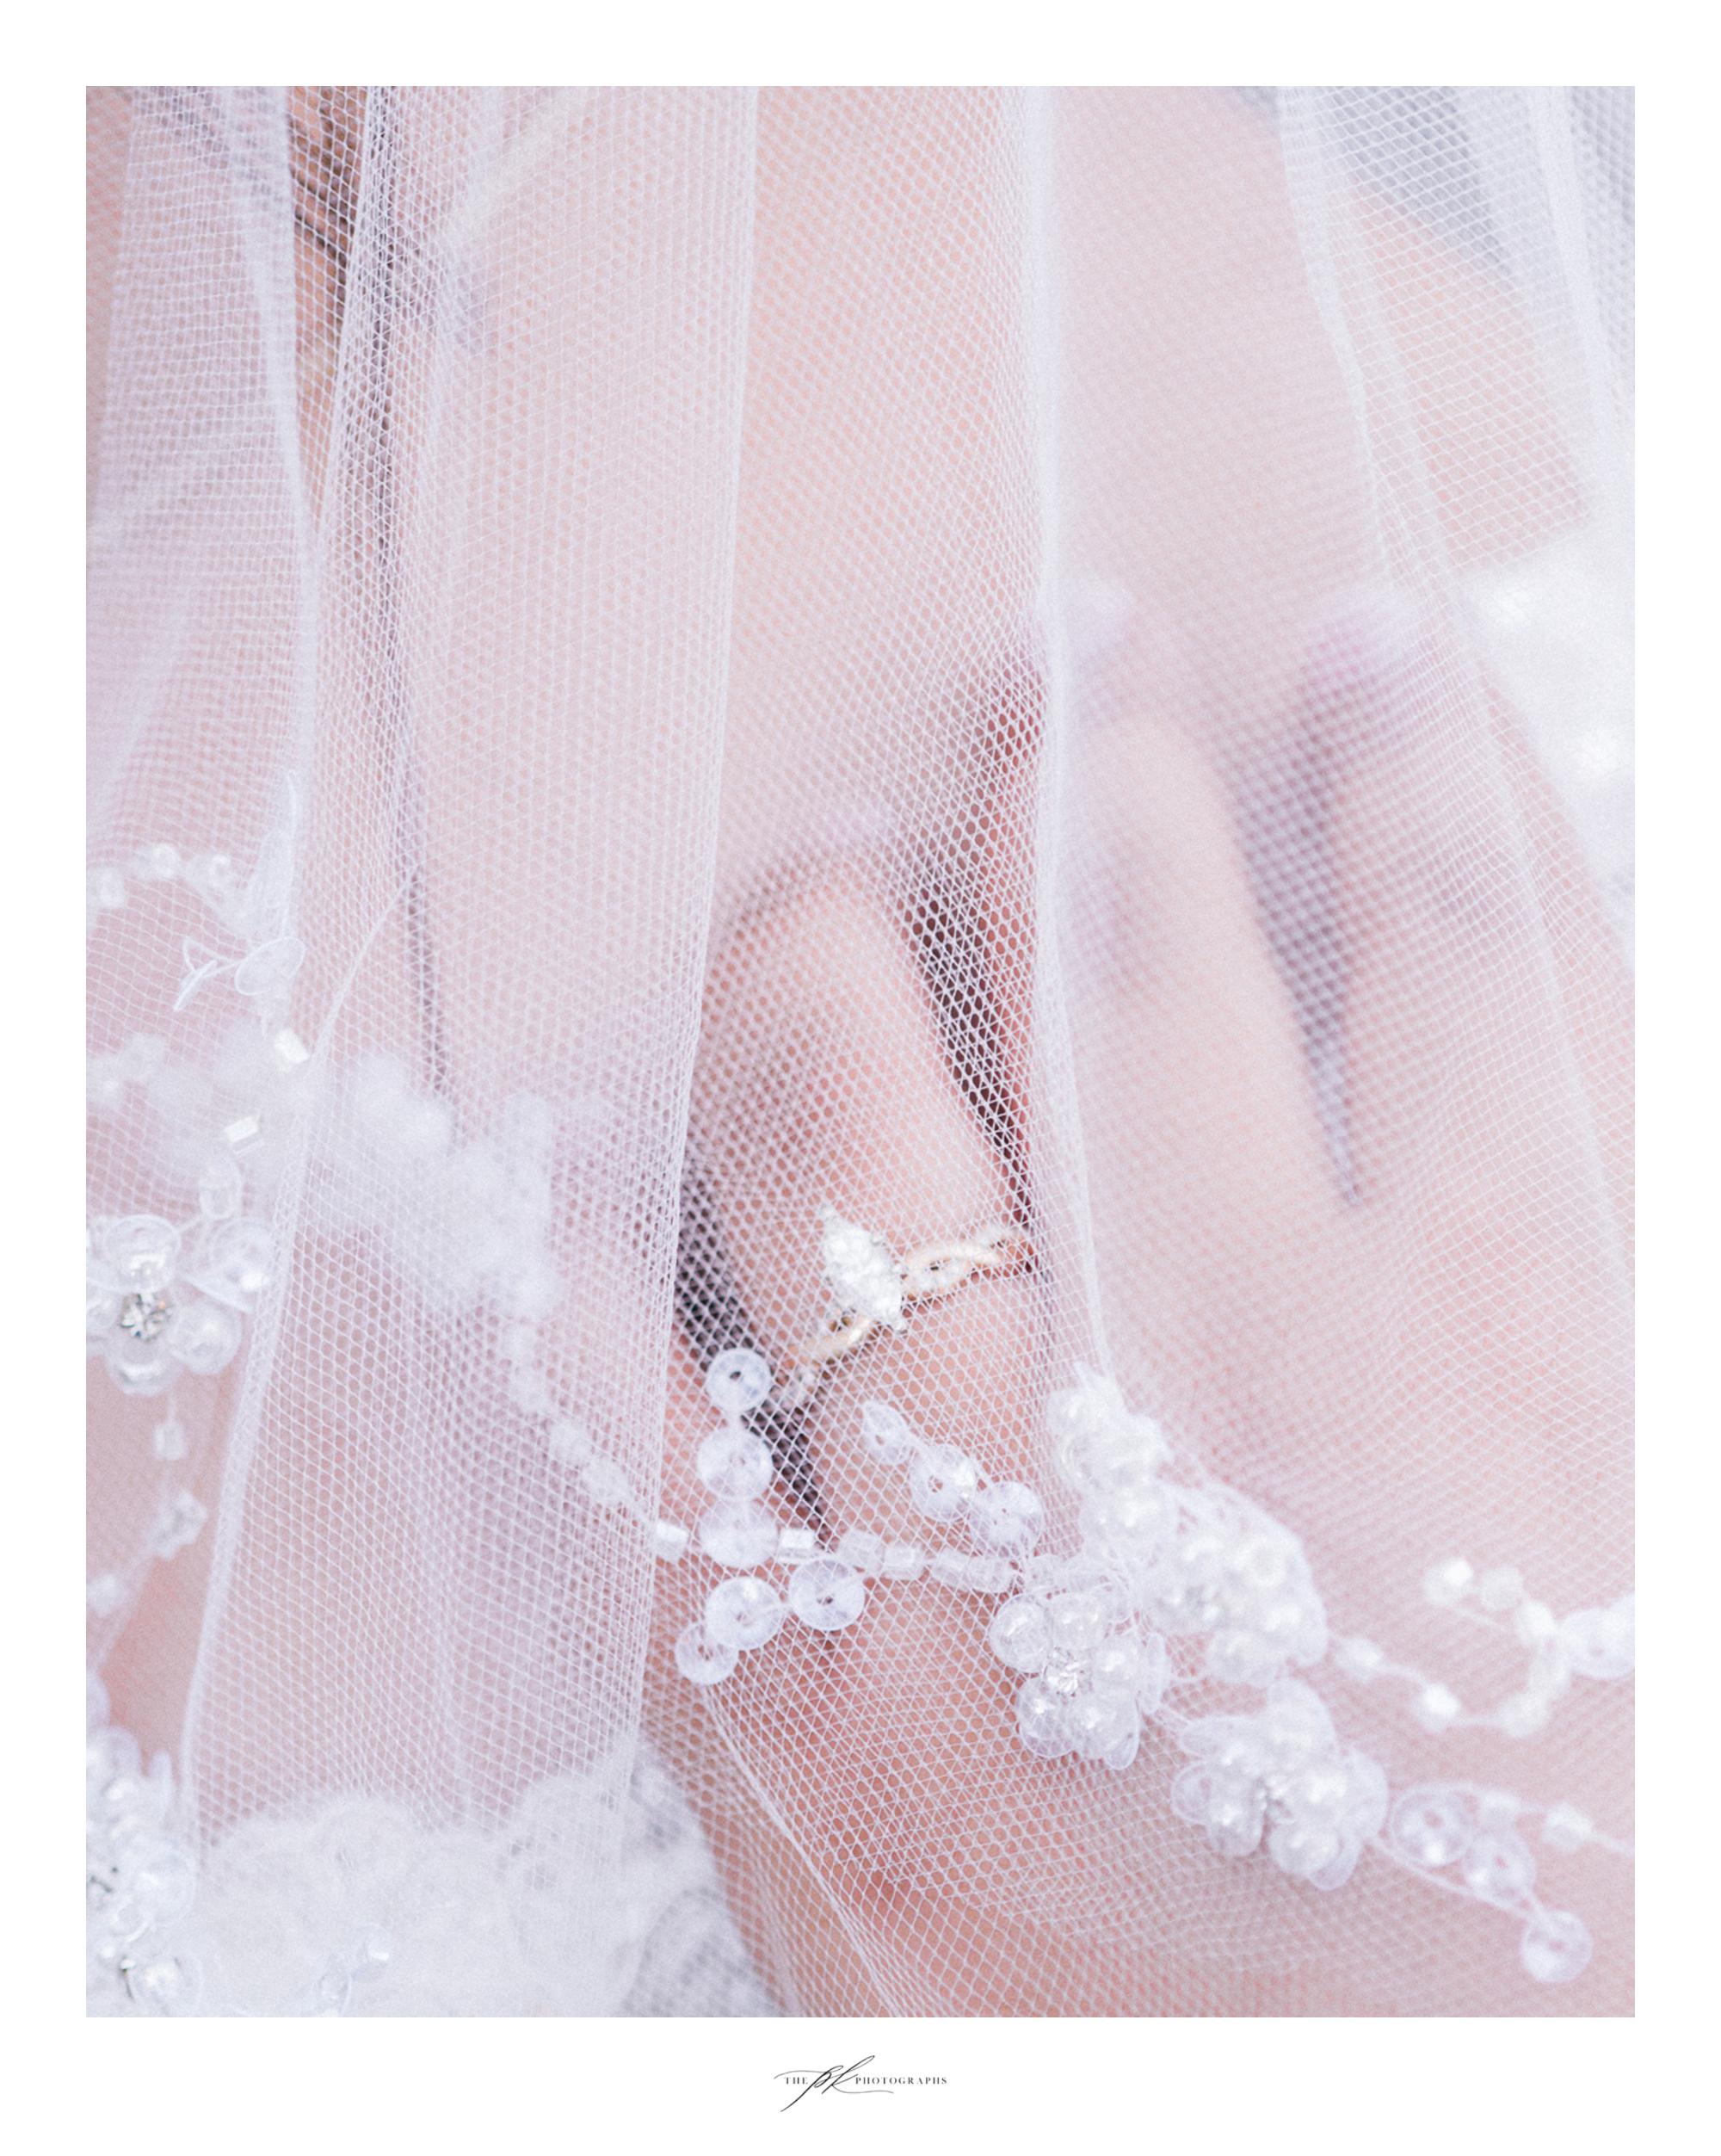 Emily's veil and custom designed engagement ring.